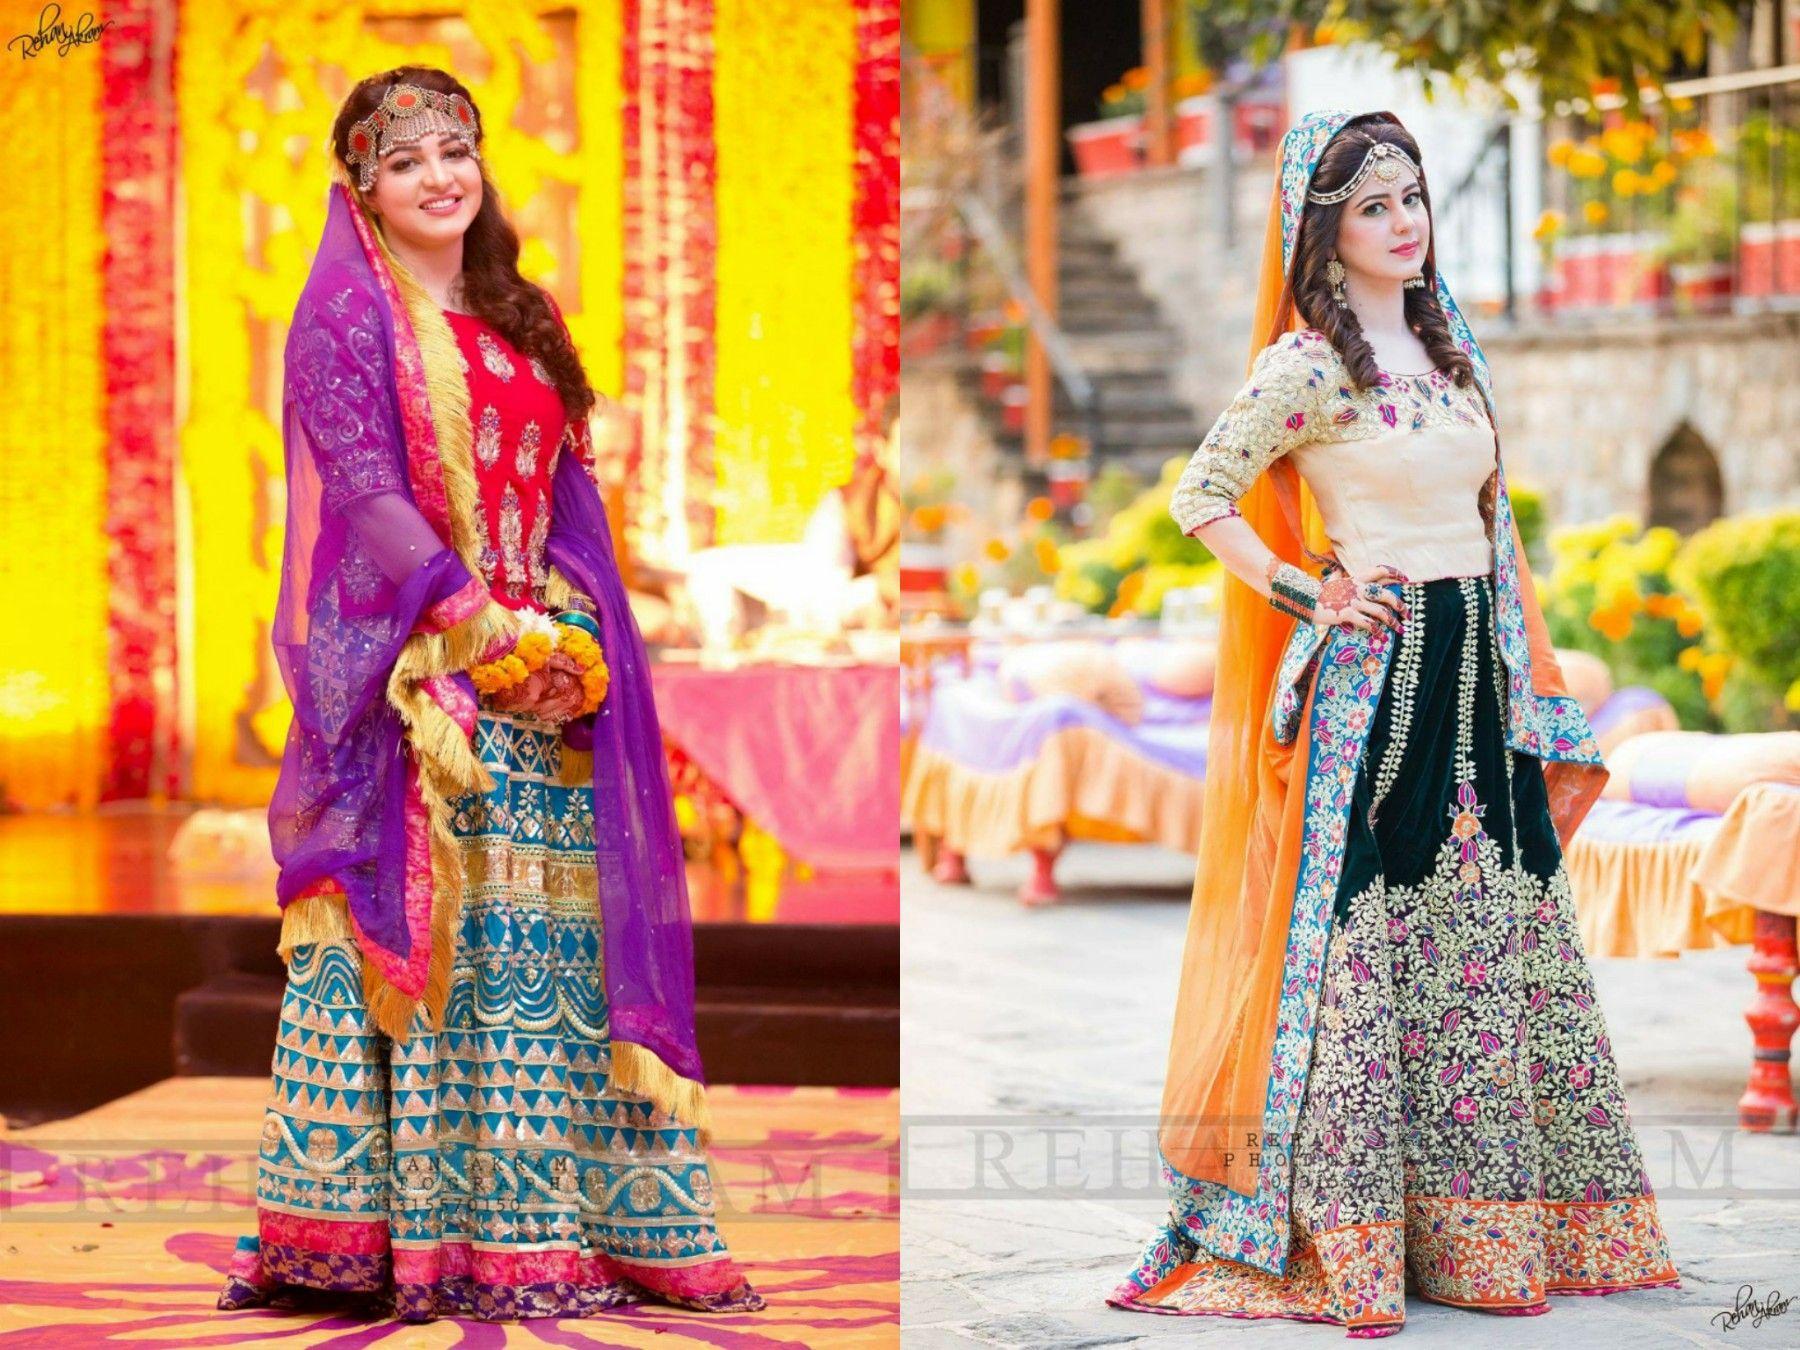 Mehndi Clothes For Brides : Photography by rehan akram mehndi bridal dress wear